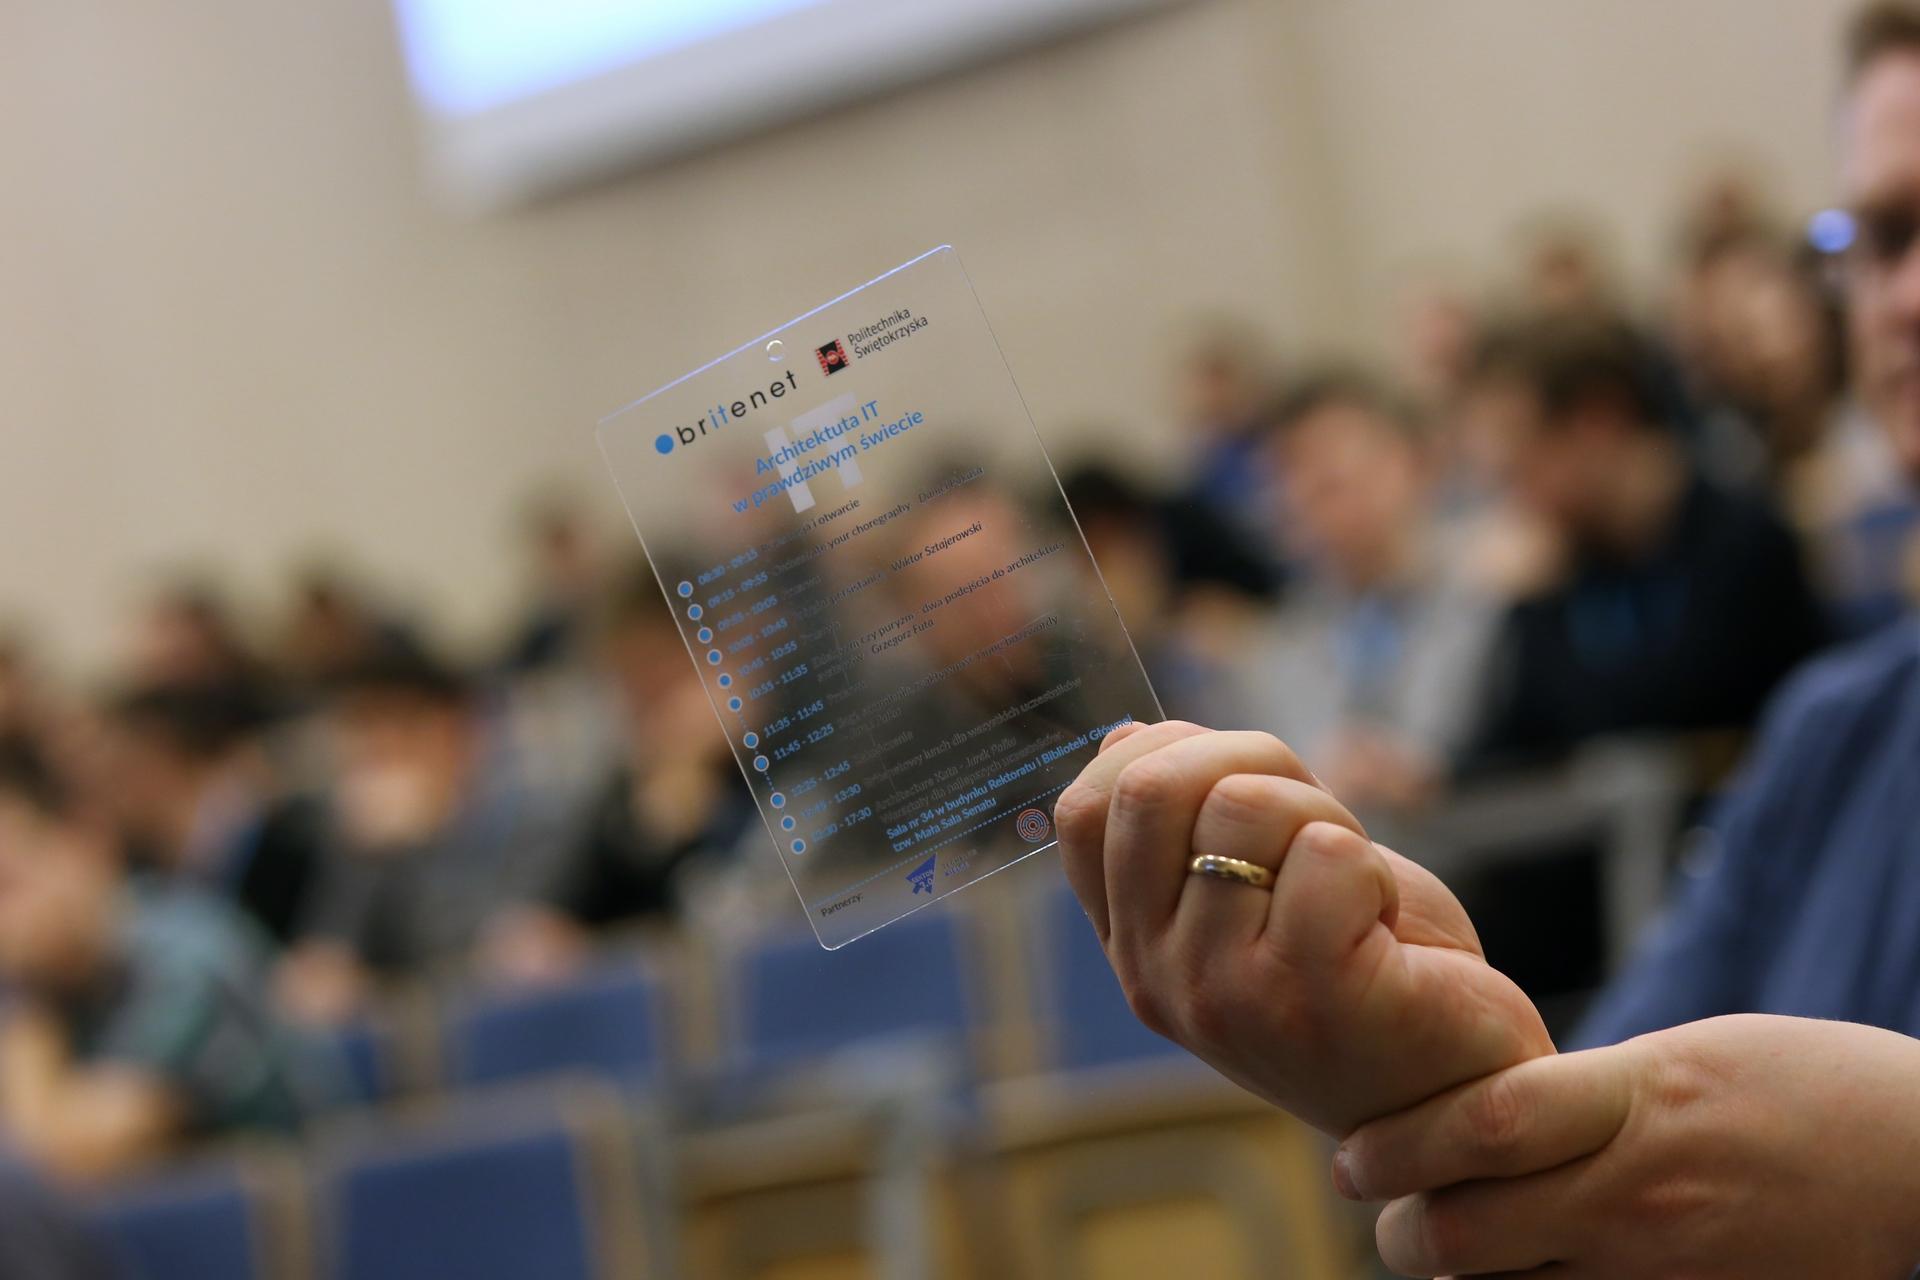 Ponadtechnologiczna konferencja IT